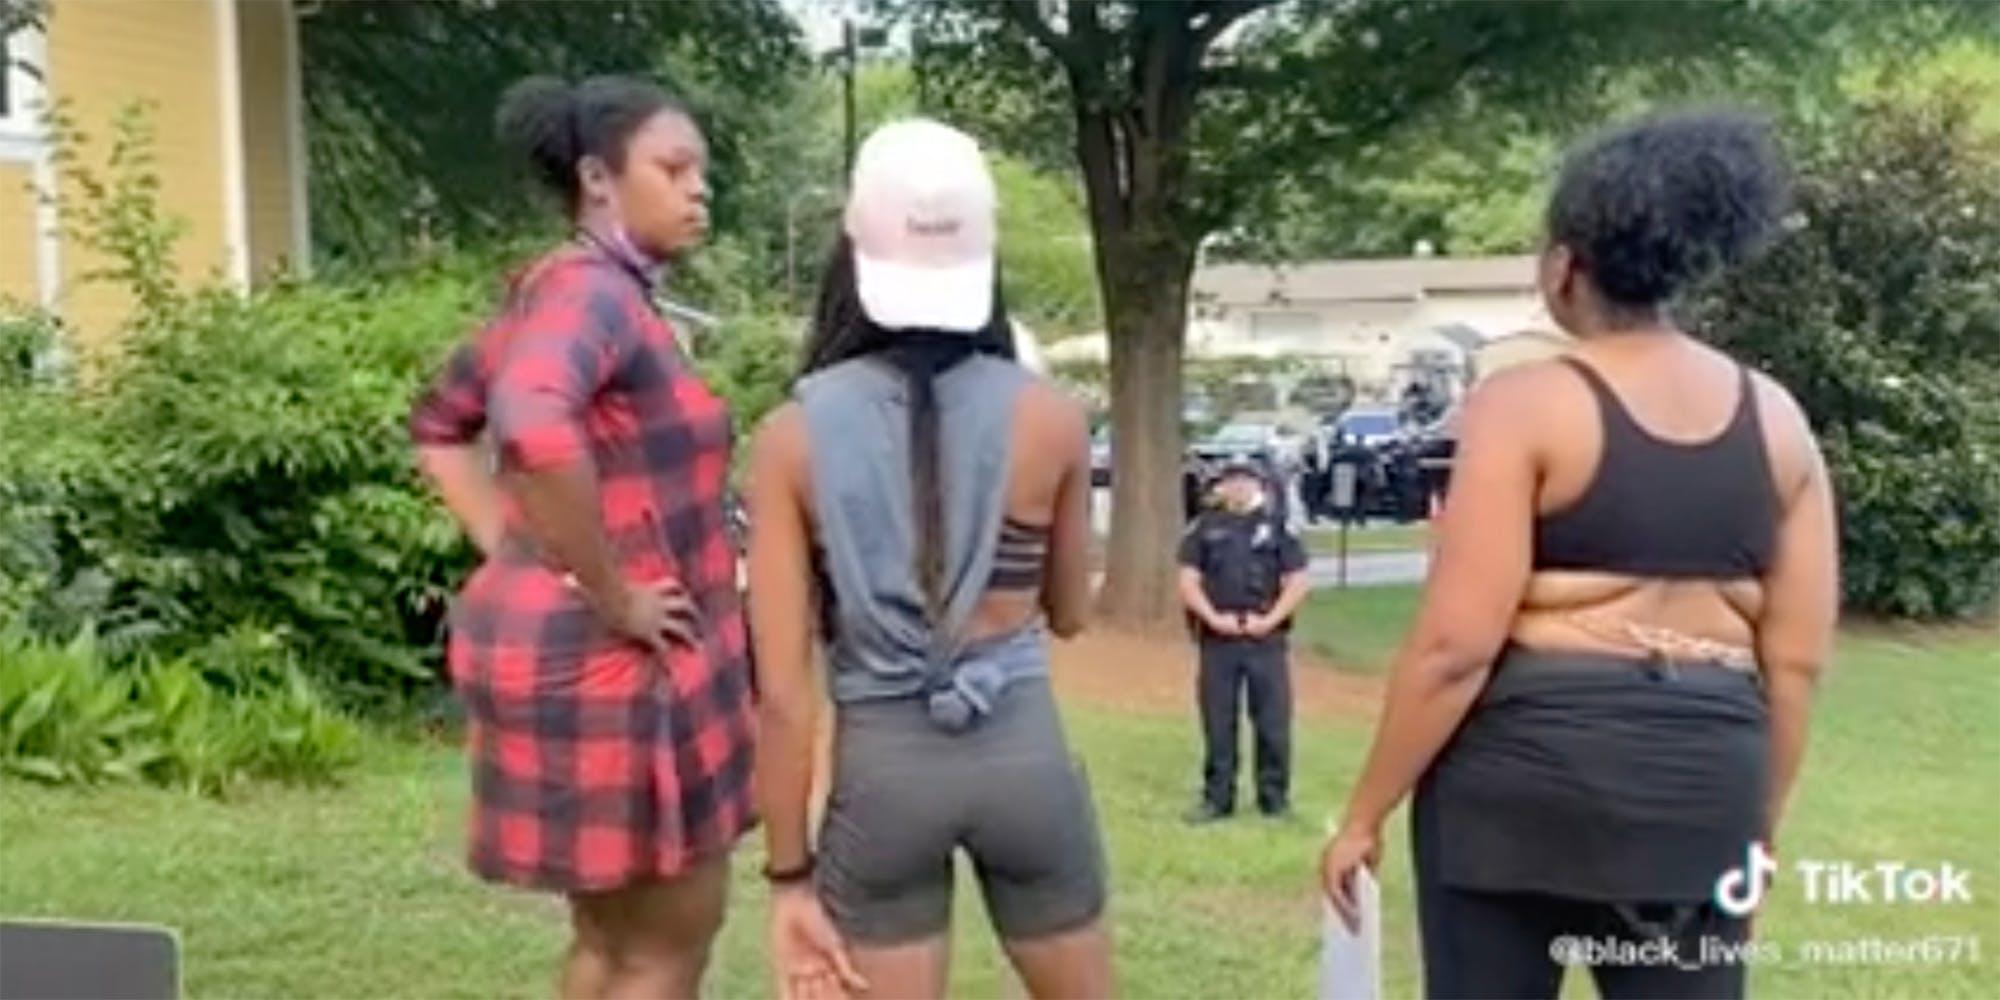 Black women confront police